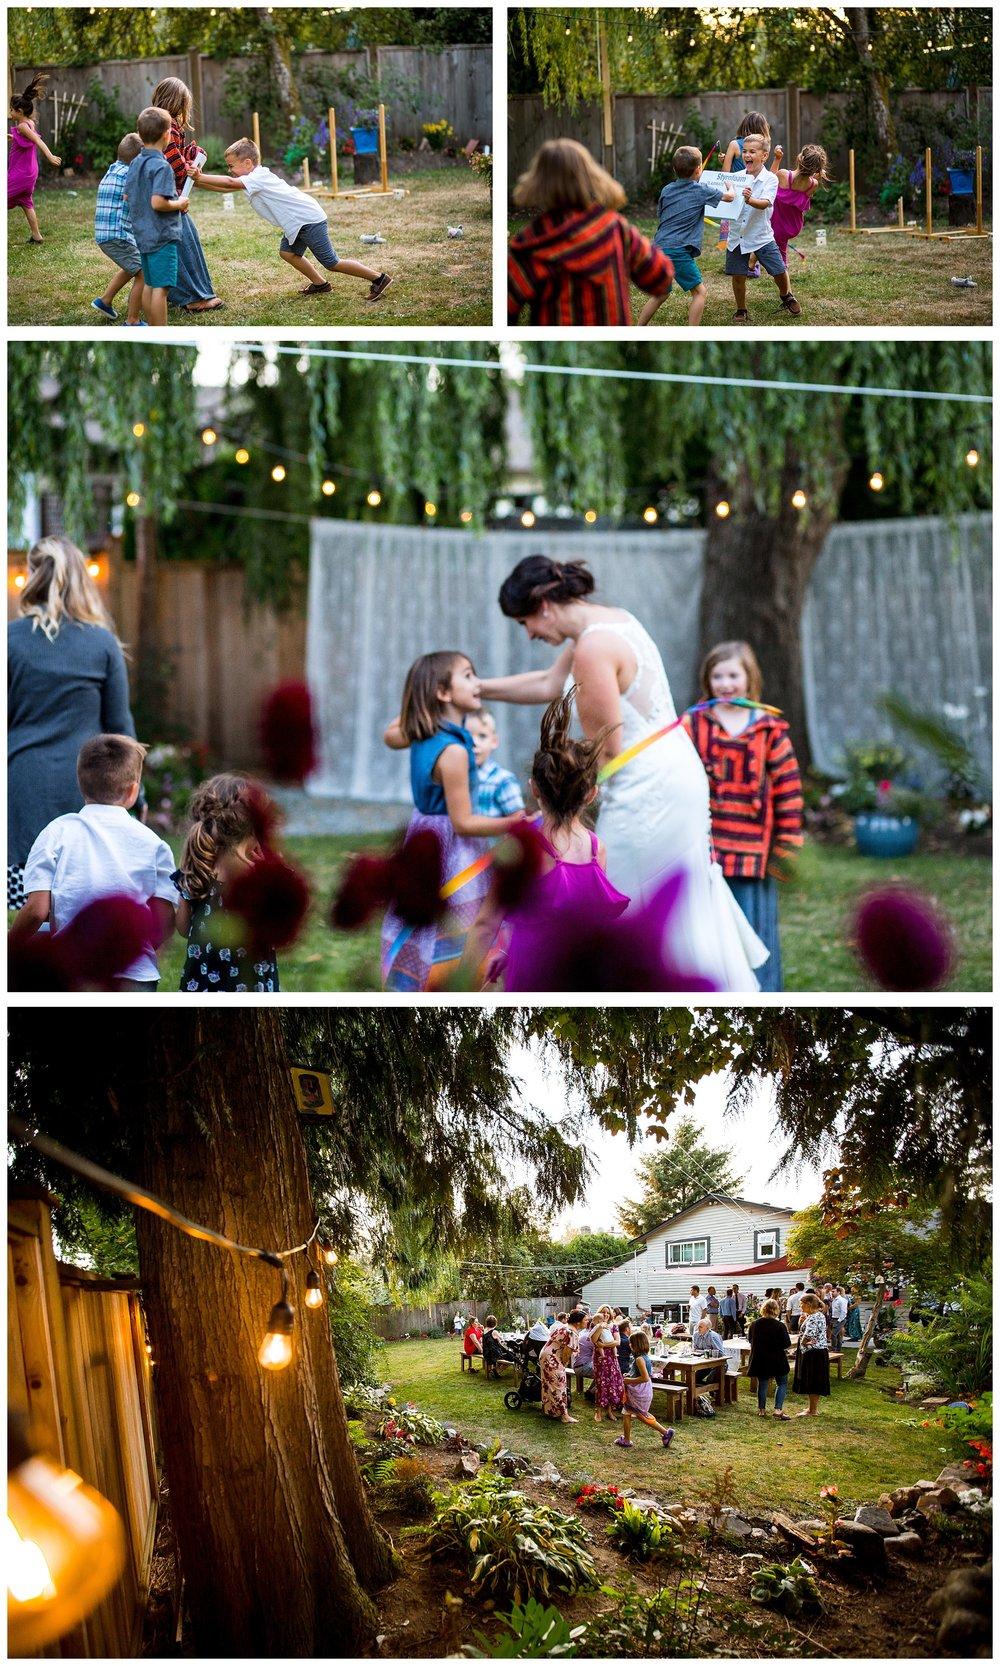 Aldergrove backyard summer wedding photographer bc canada outdoor garden inspiration family couple with kids, bride and groom_0082.jpg